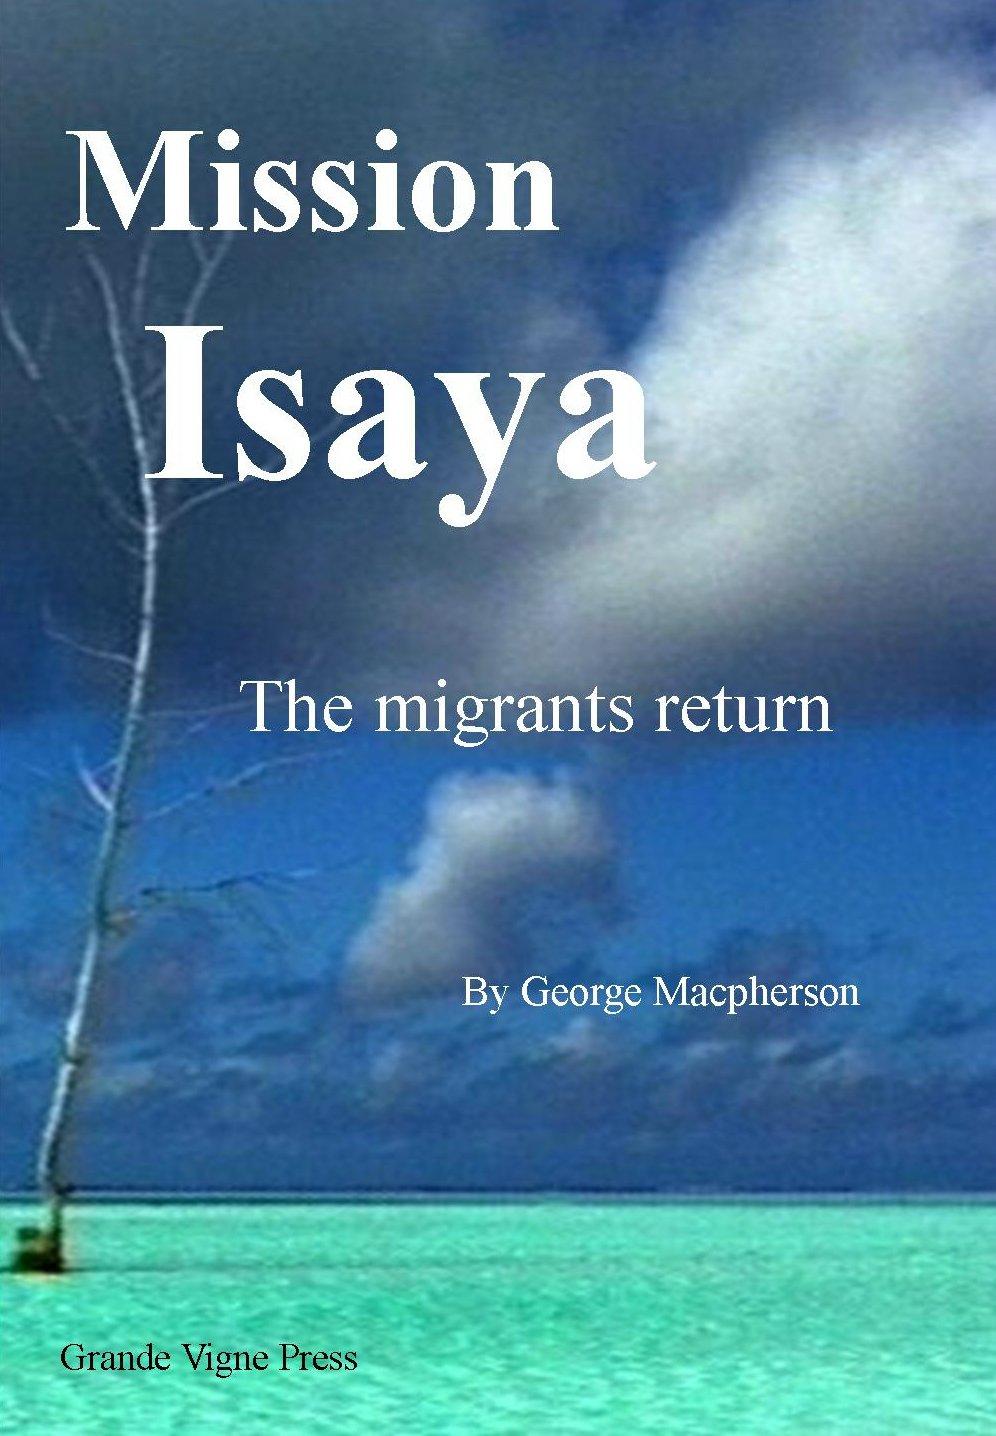 Mission Isaya